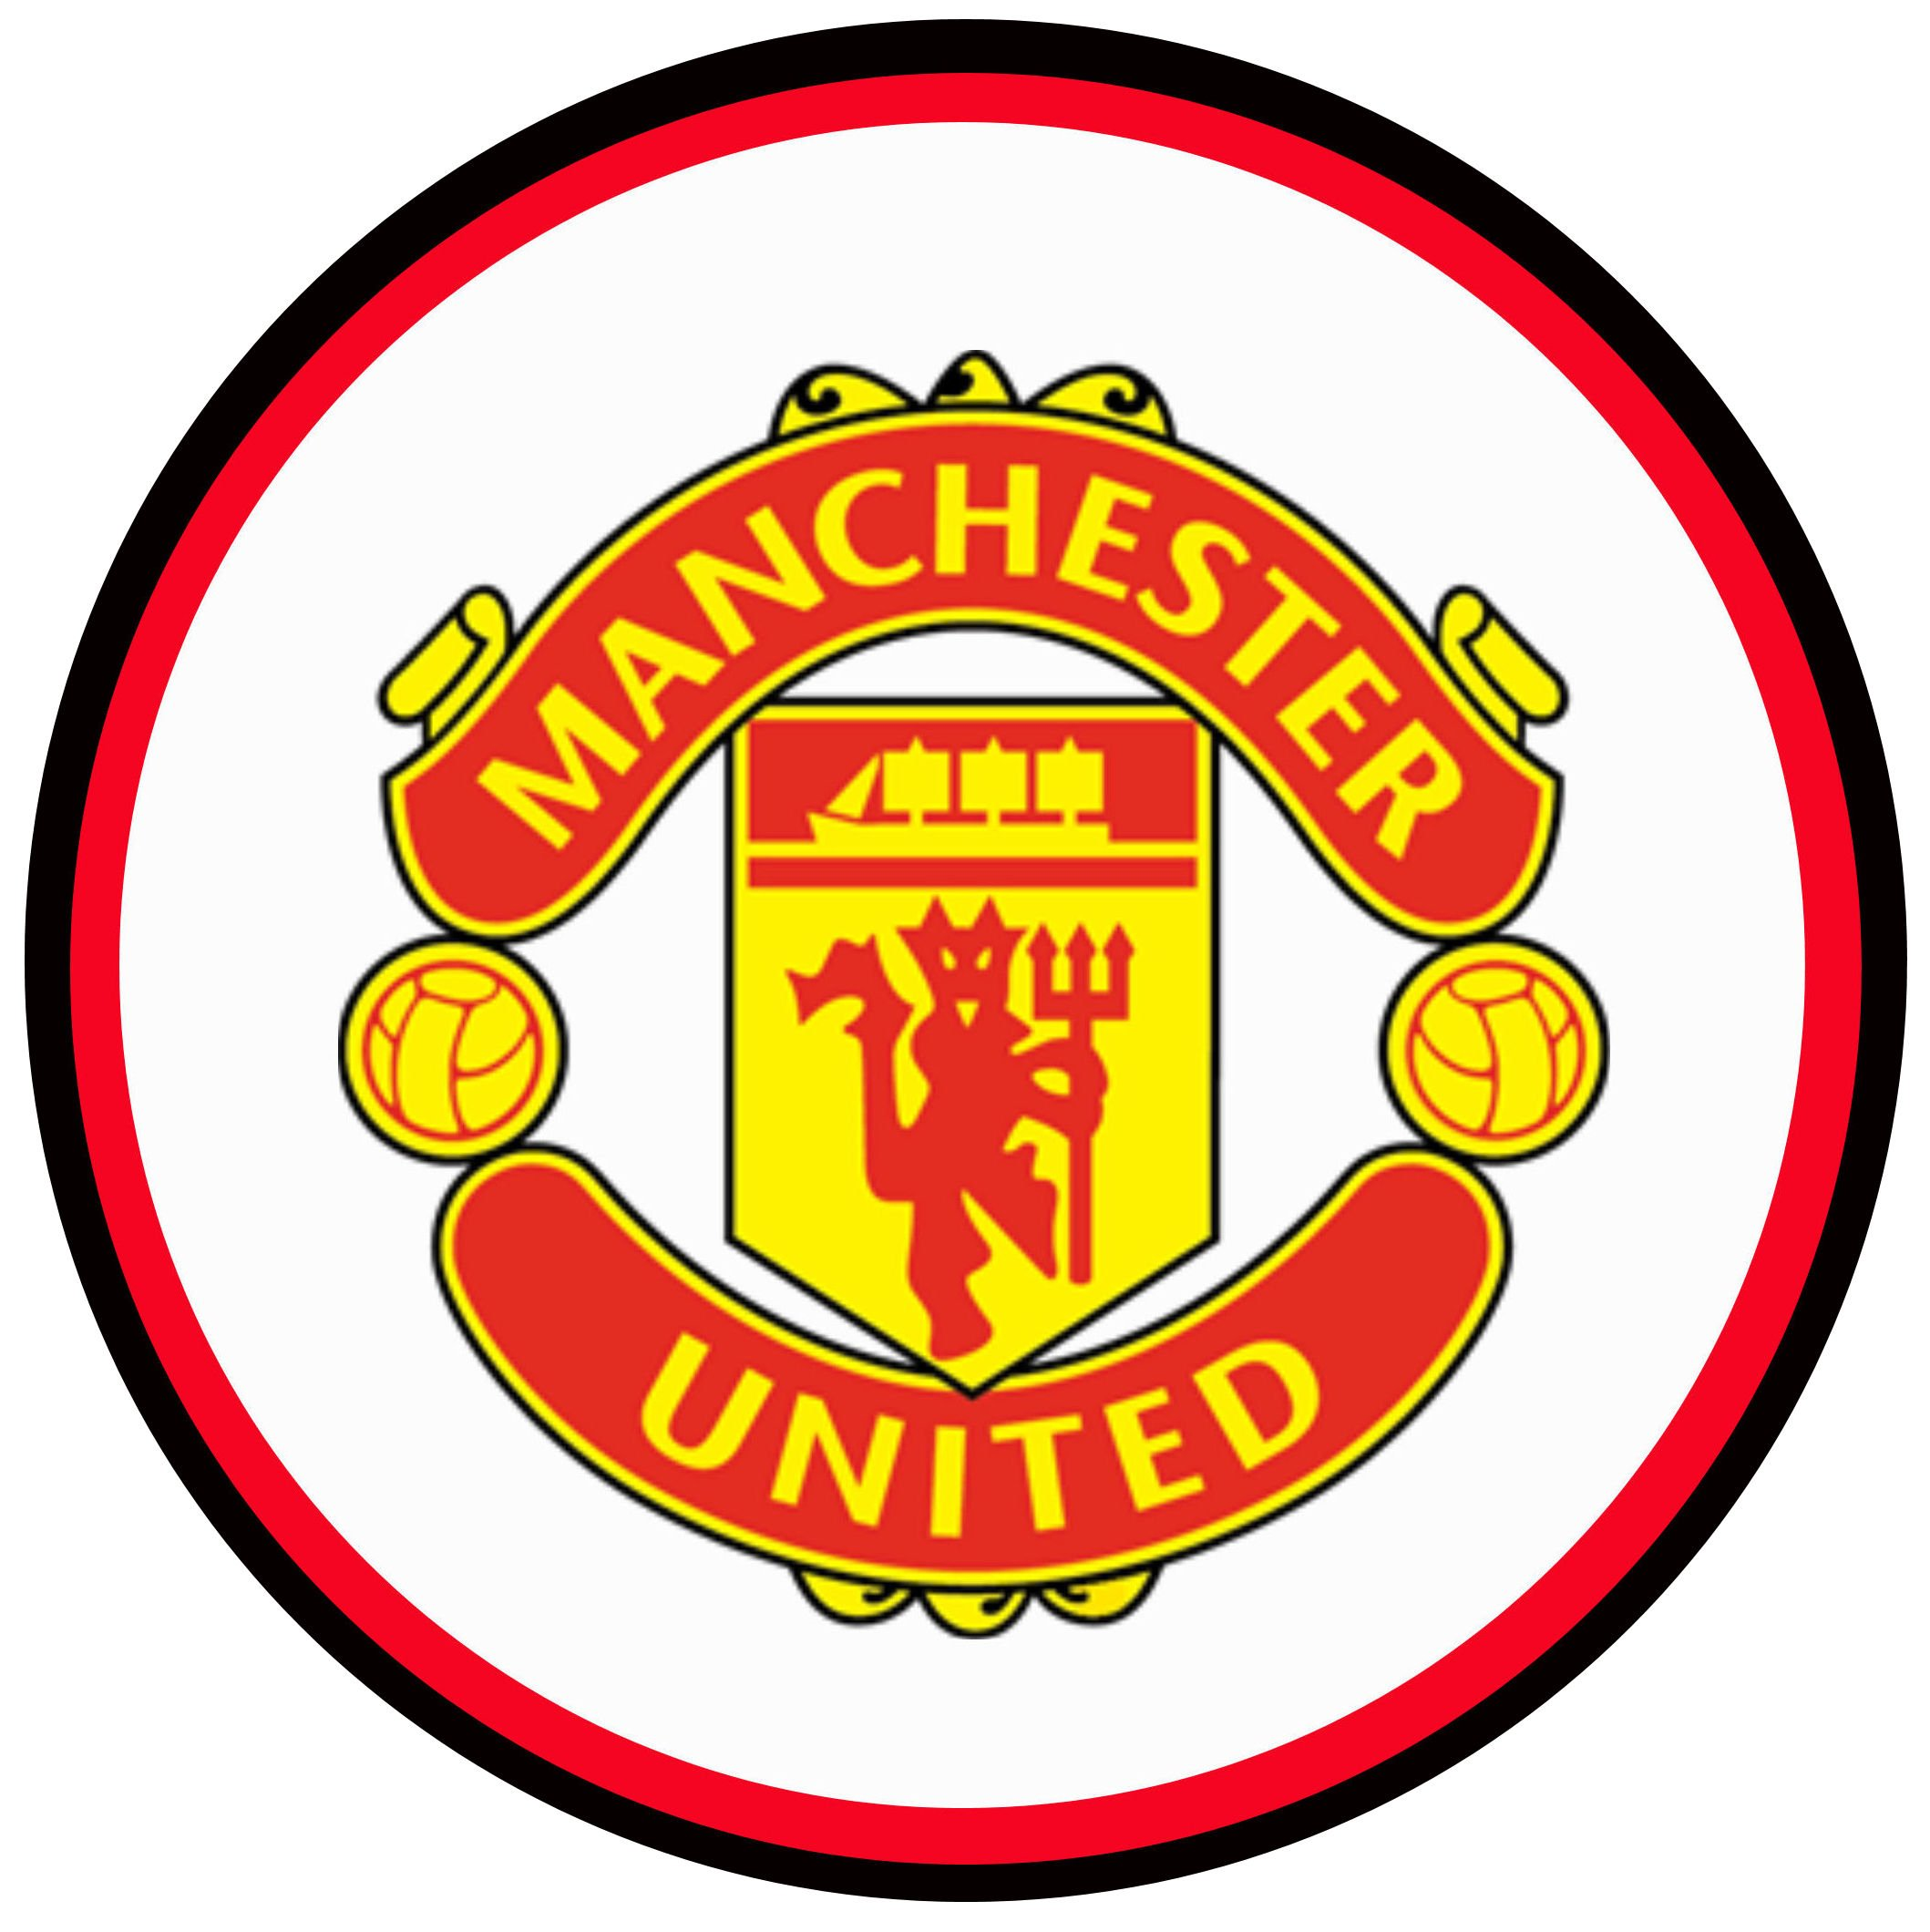 manchester united logo circle cake topper rh wagcakebits co uk  manchester united logo pictures download